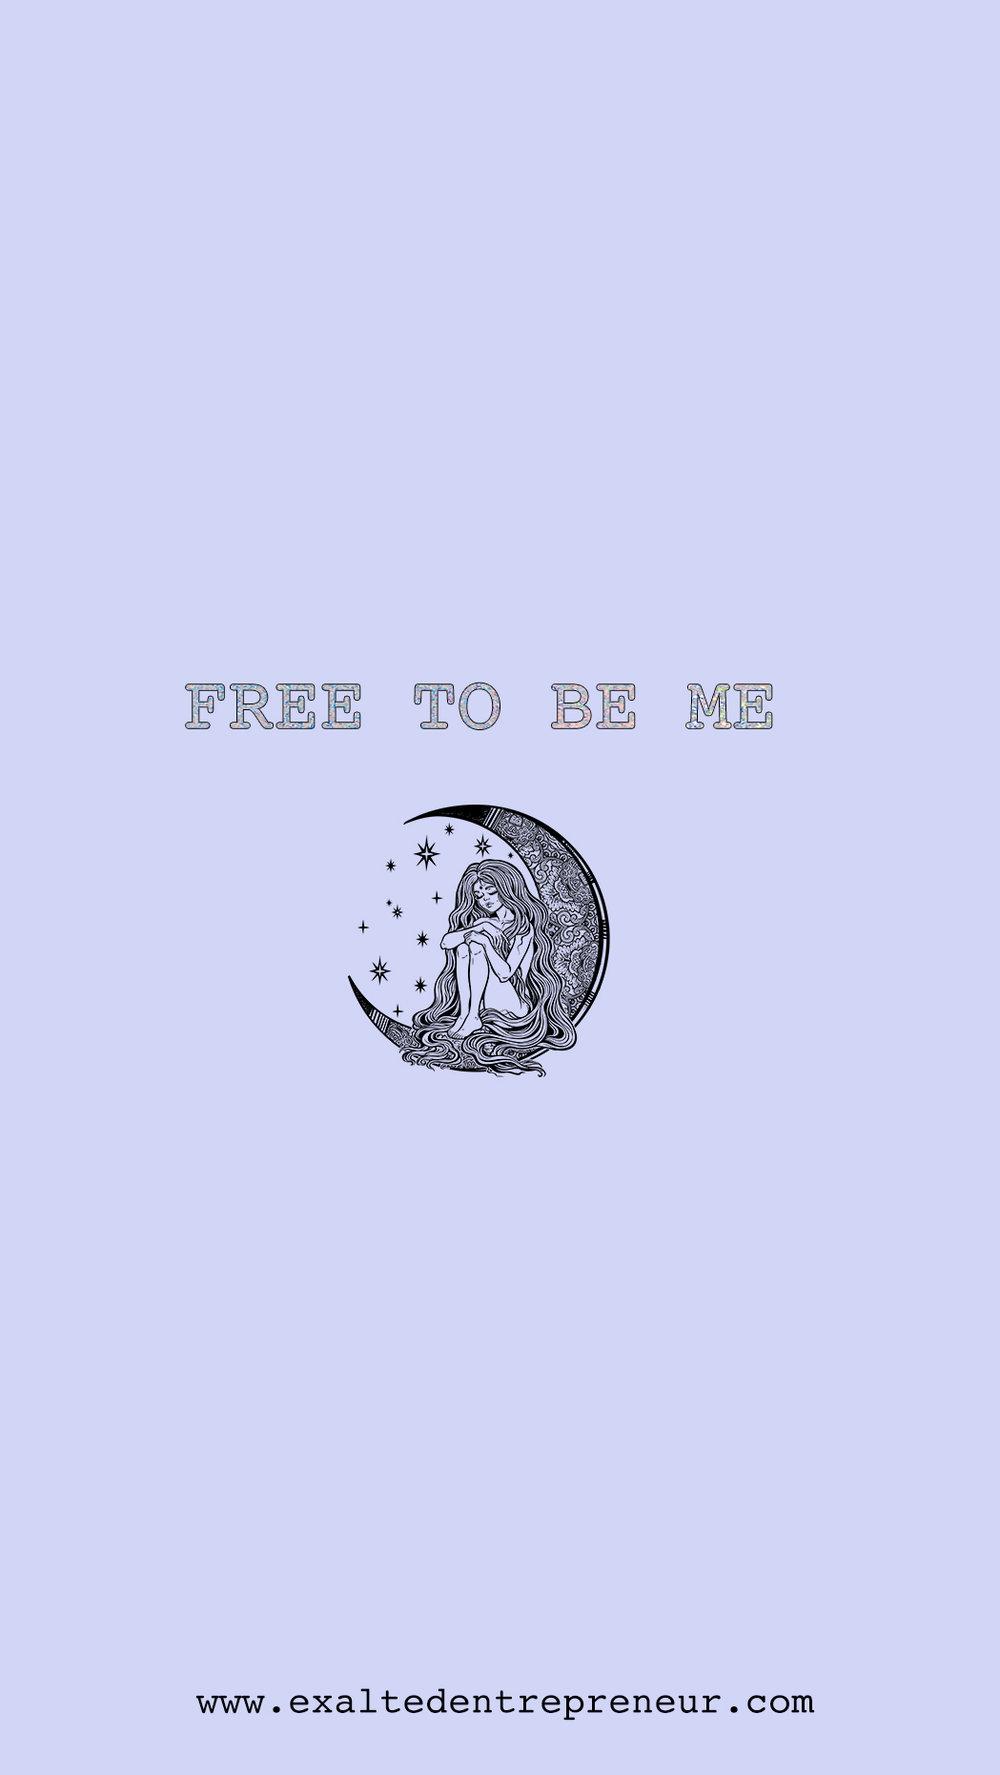 free to be me wallpaper.jpg